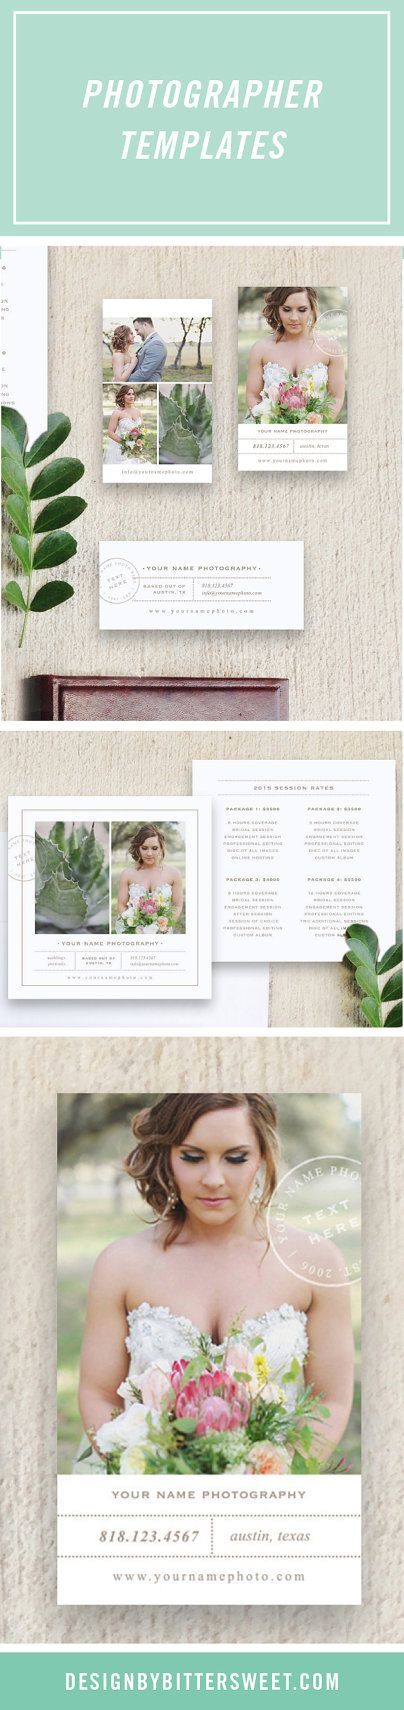 Wedding Photography Marketing Ideas: 25+ Best Ideas About Photography Marketing On Pinterest